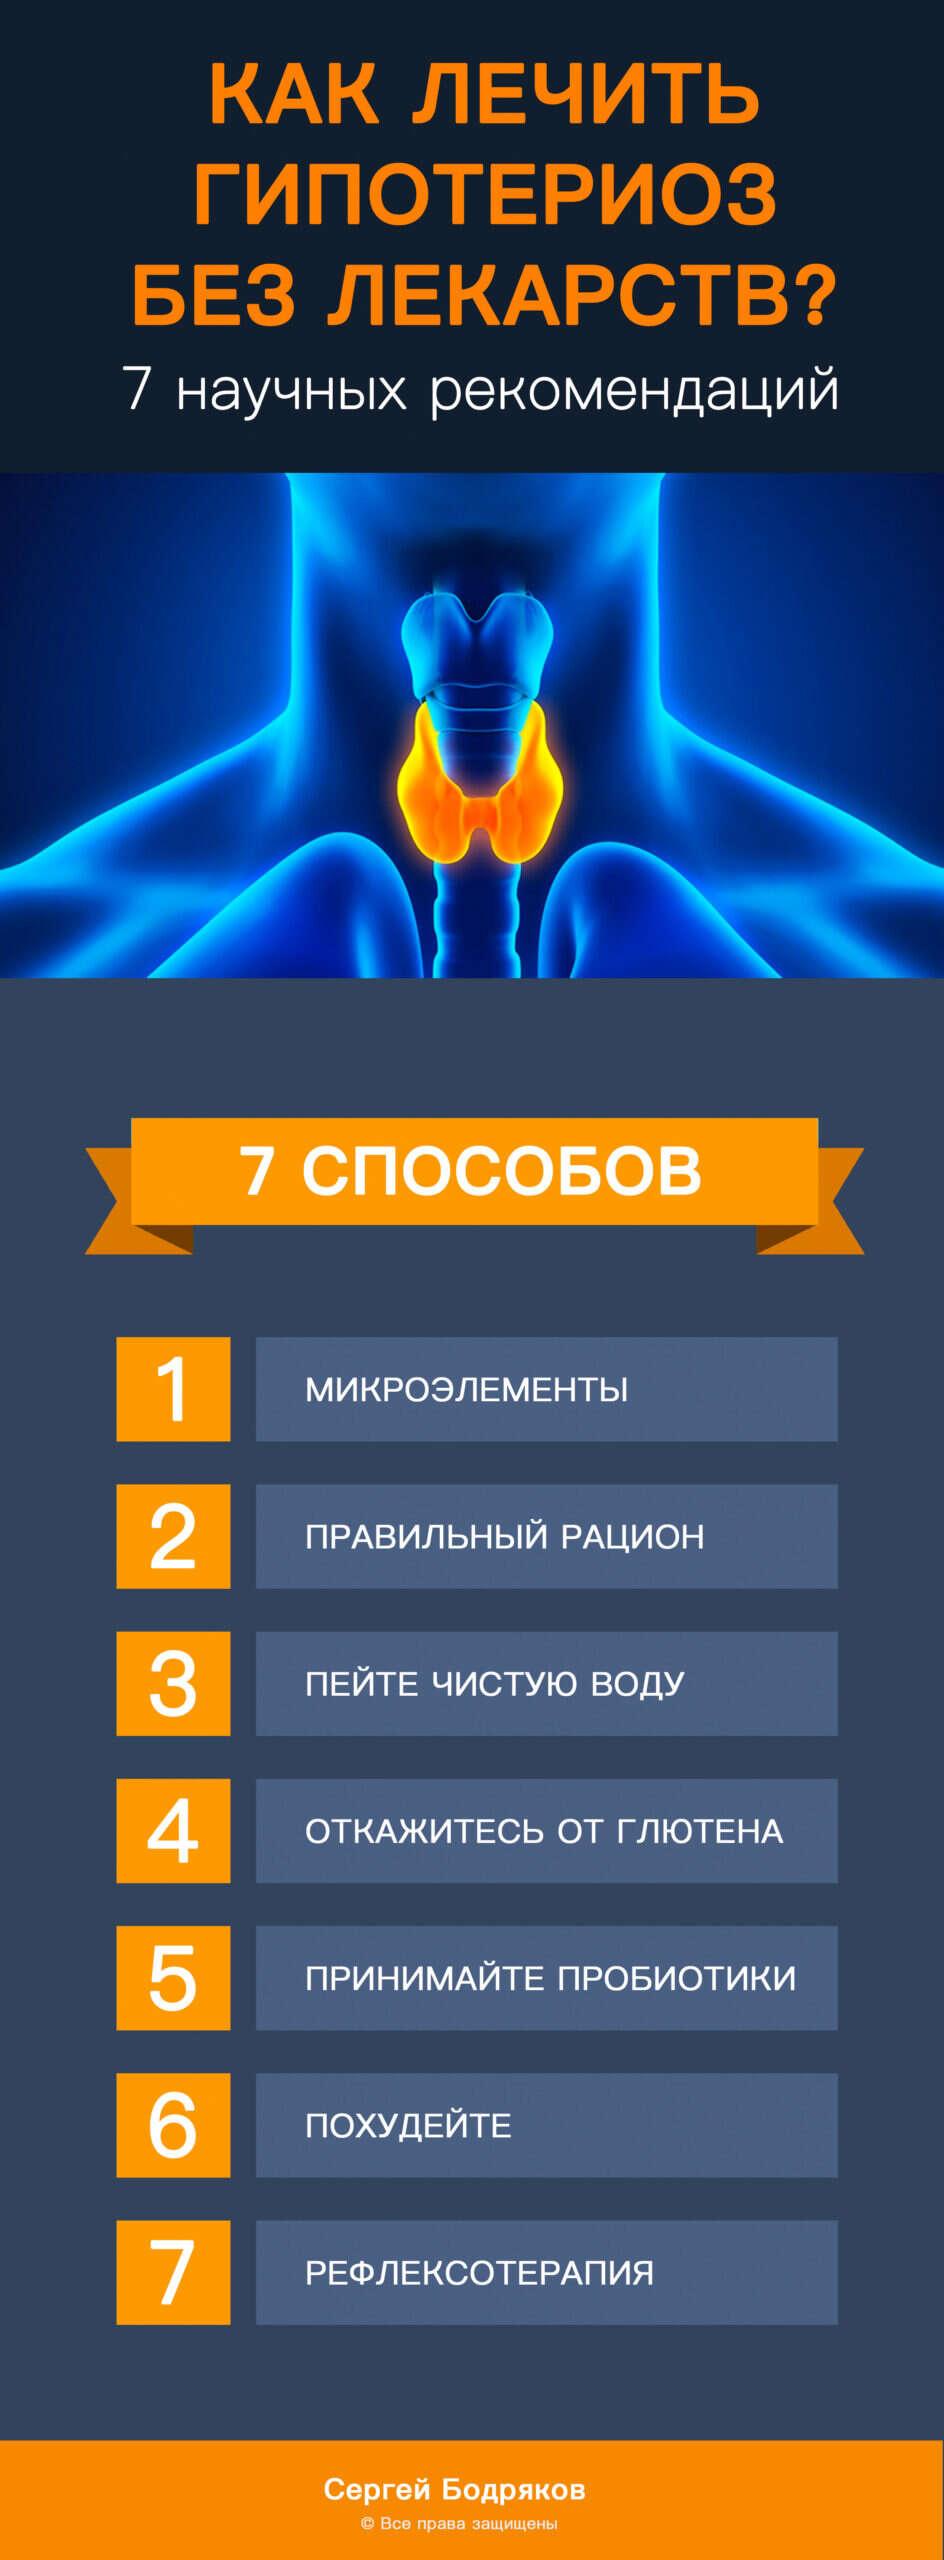 gipoterioz-lechenie-bez-gormonov